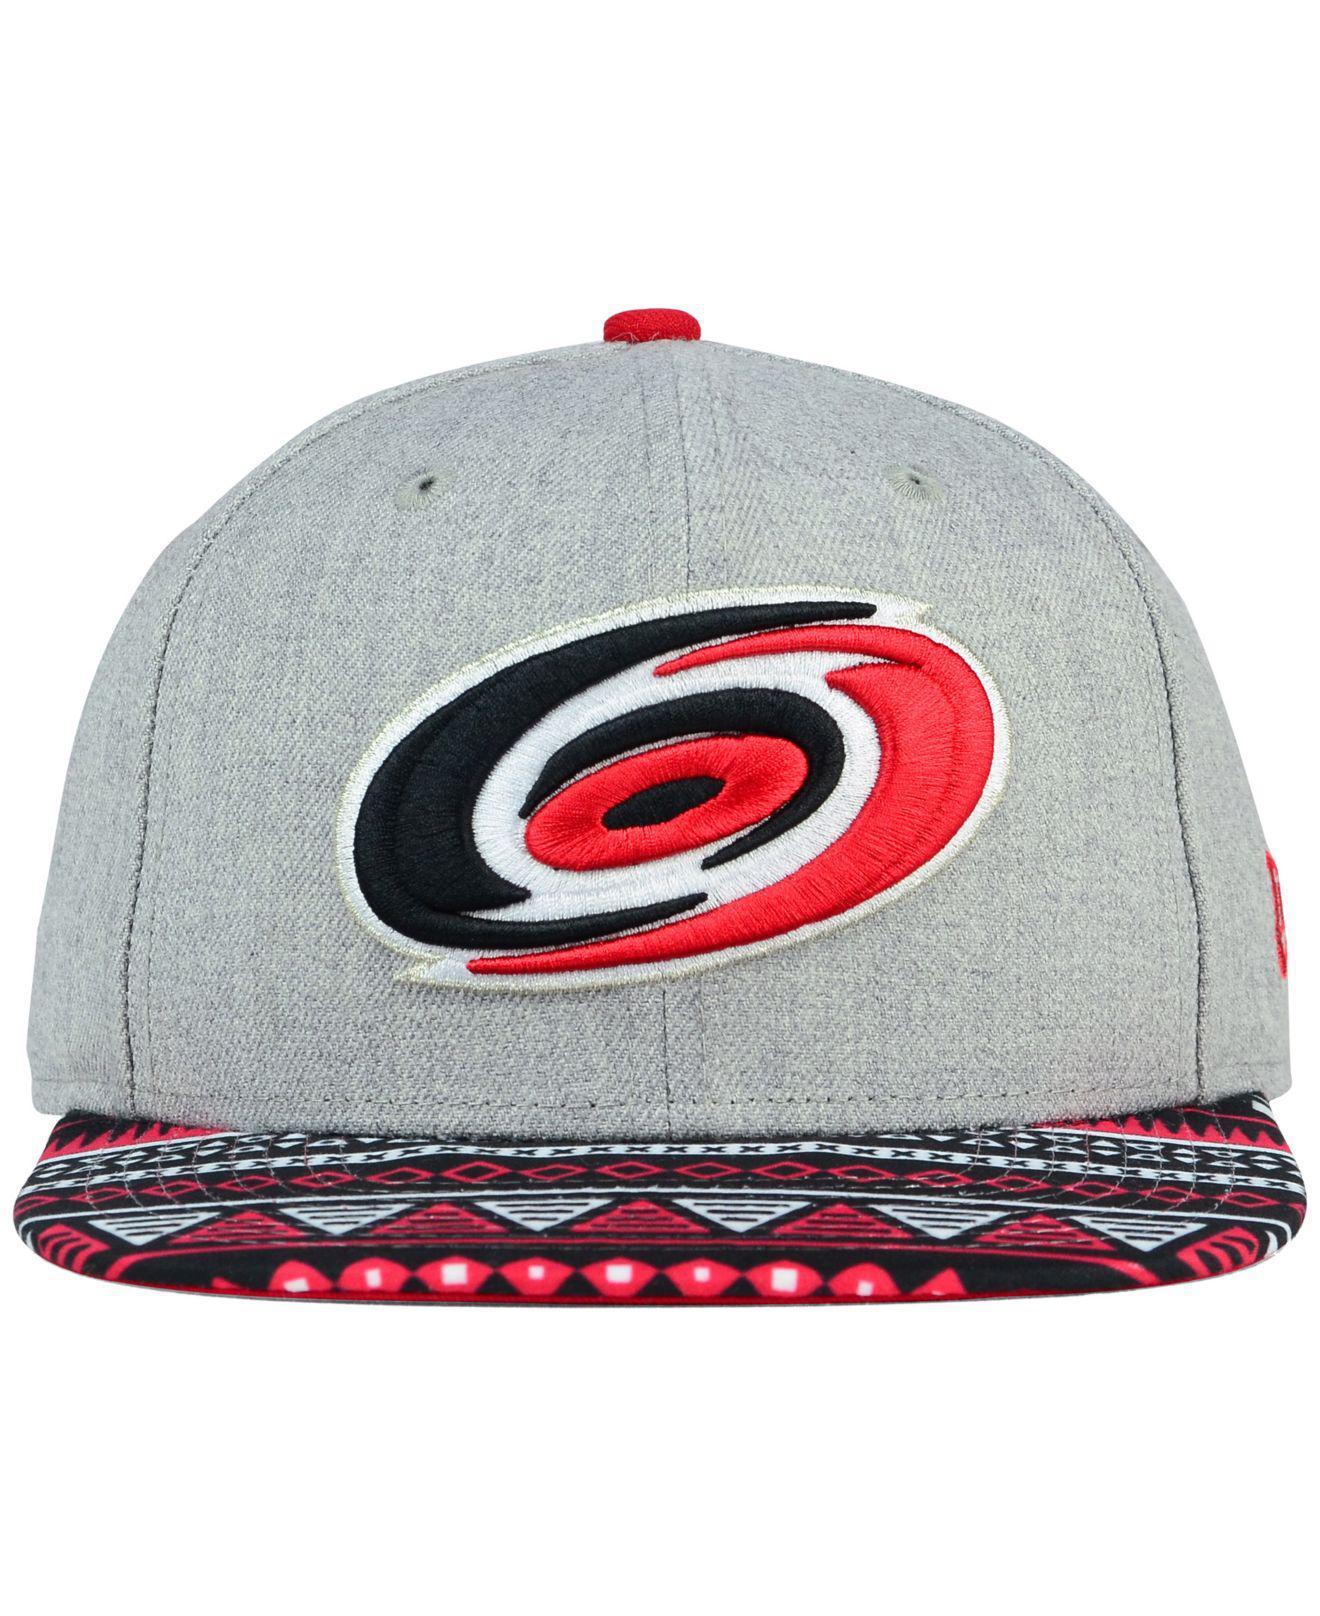 finest selection 24459 66710 Lyst - KTZ Carolina Hurricanes Neon Mashup 9fifty Snapback Cap in ...